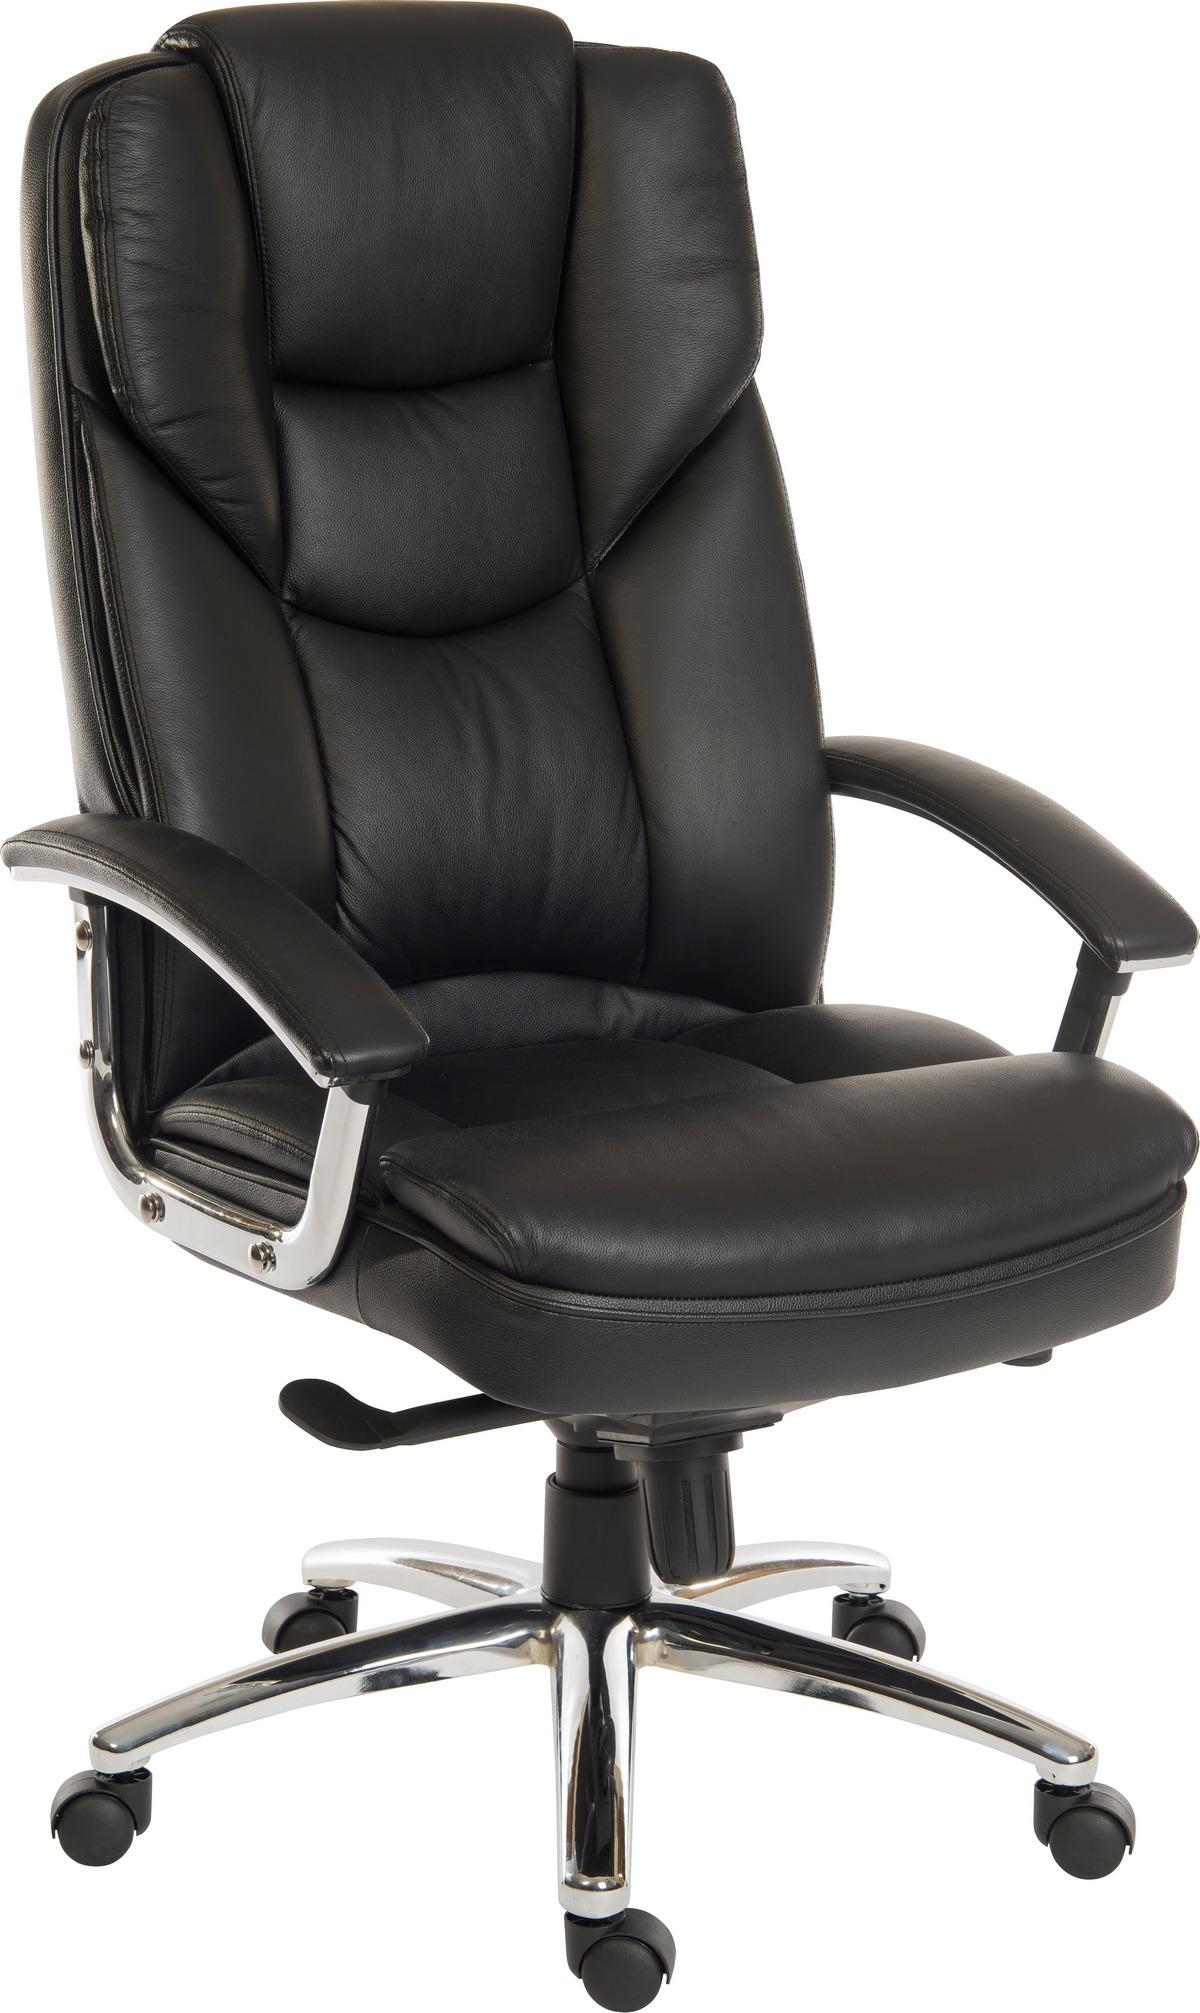 Skyline Ergonomic Office Chair | Posture Chairs | UK